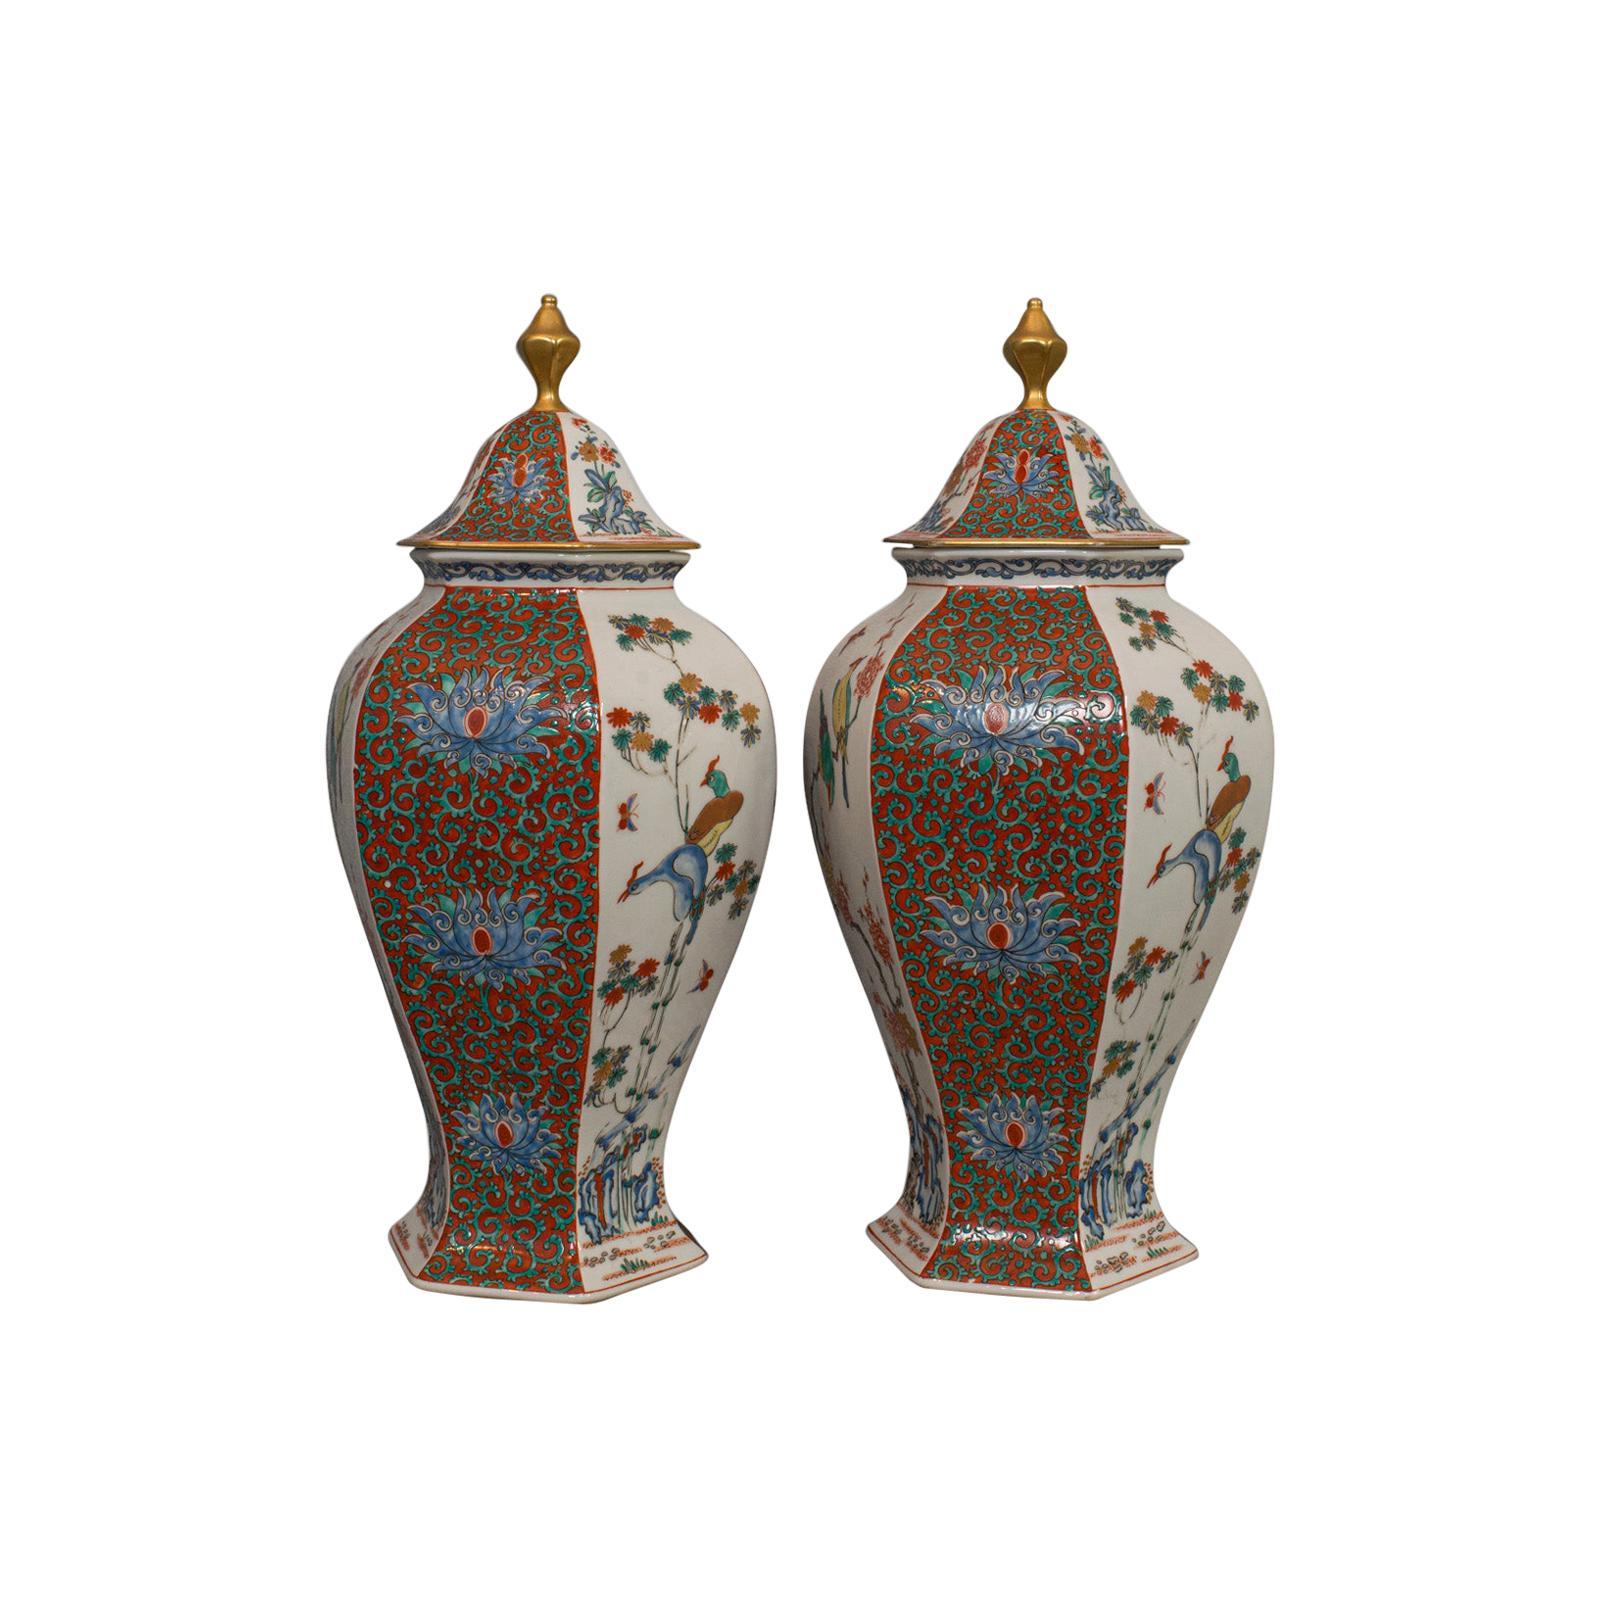 Pair of Vintage Hexagonal Spice Jars, Oriental, Ceramic, Baluster, Urn, Avian